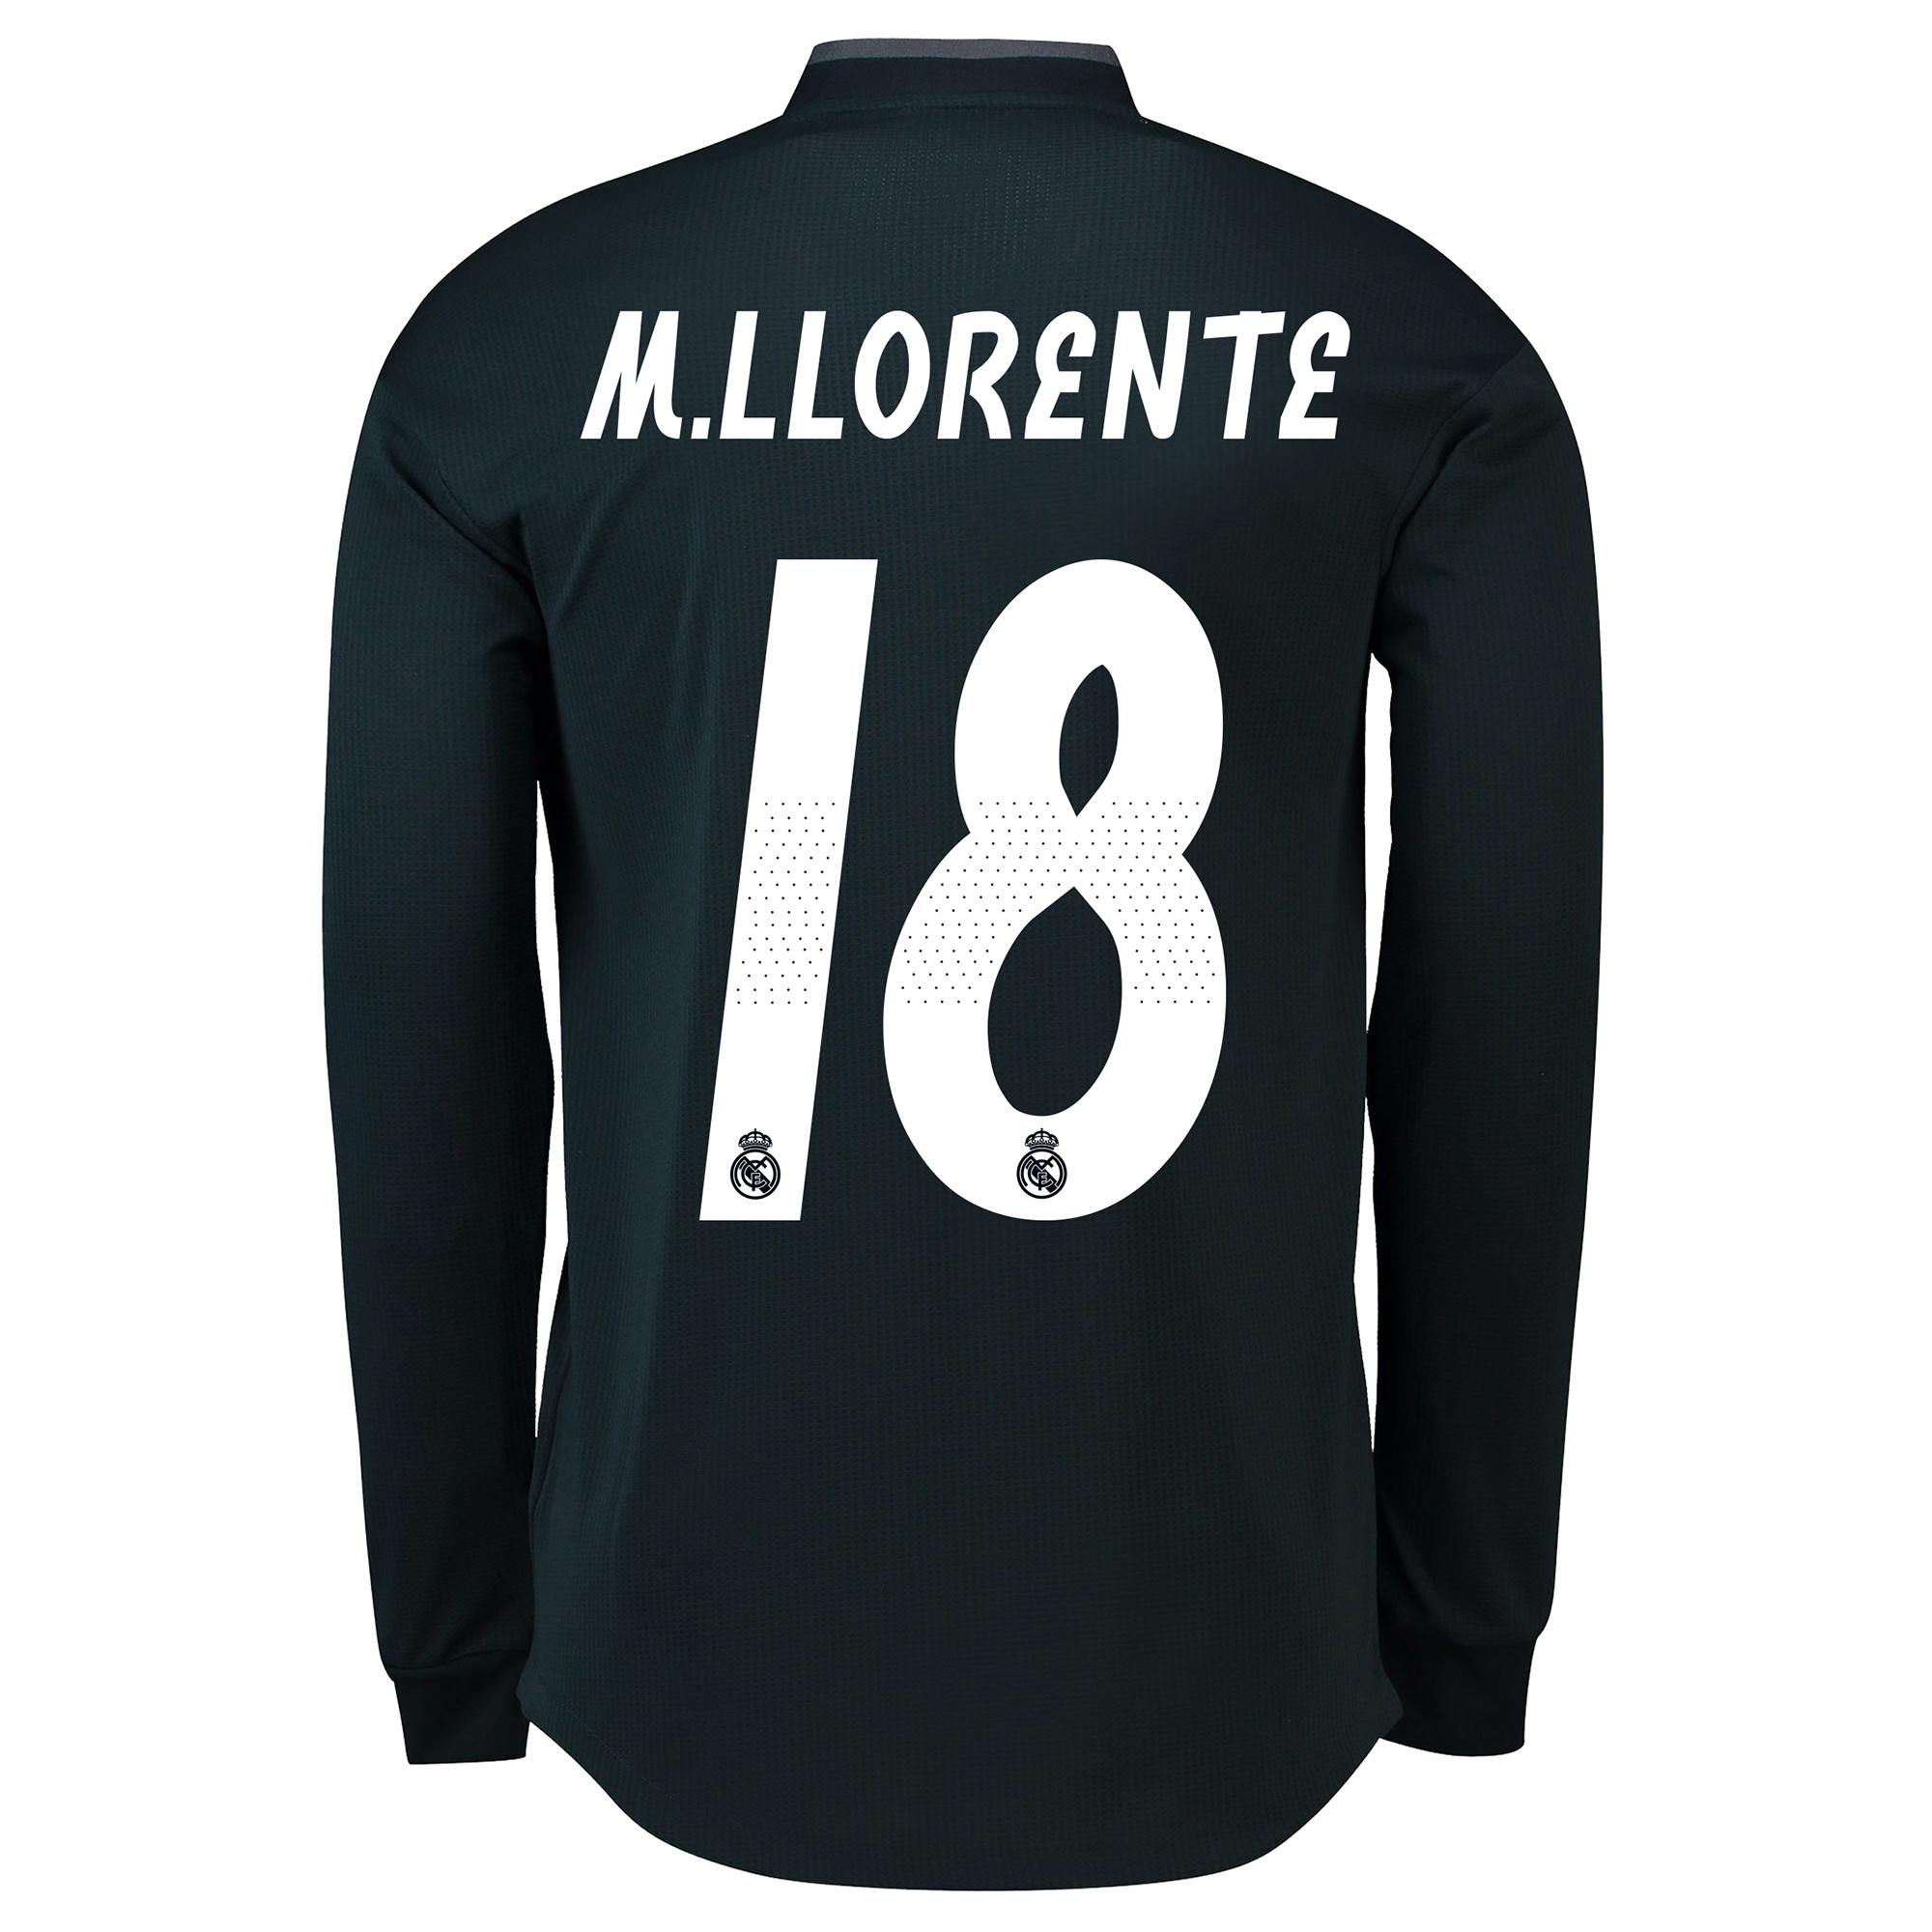 Image of Real Madrid Away Adi Zero Shirt 2018-19 - Long Sleeve with M. Llorente 18 printing